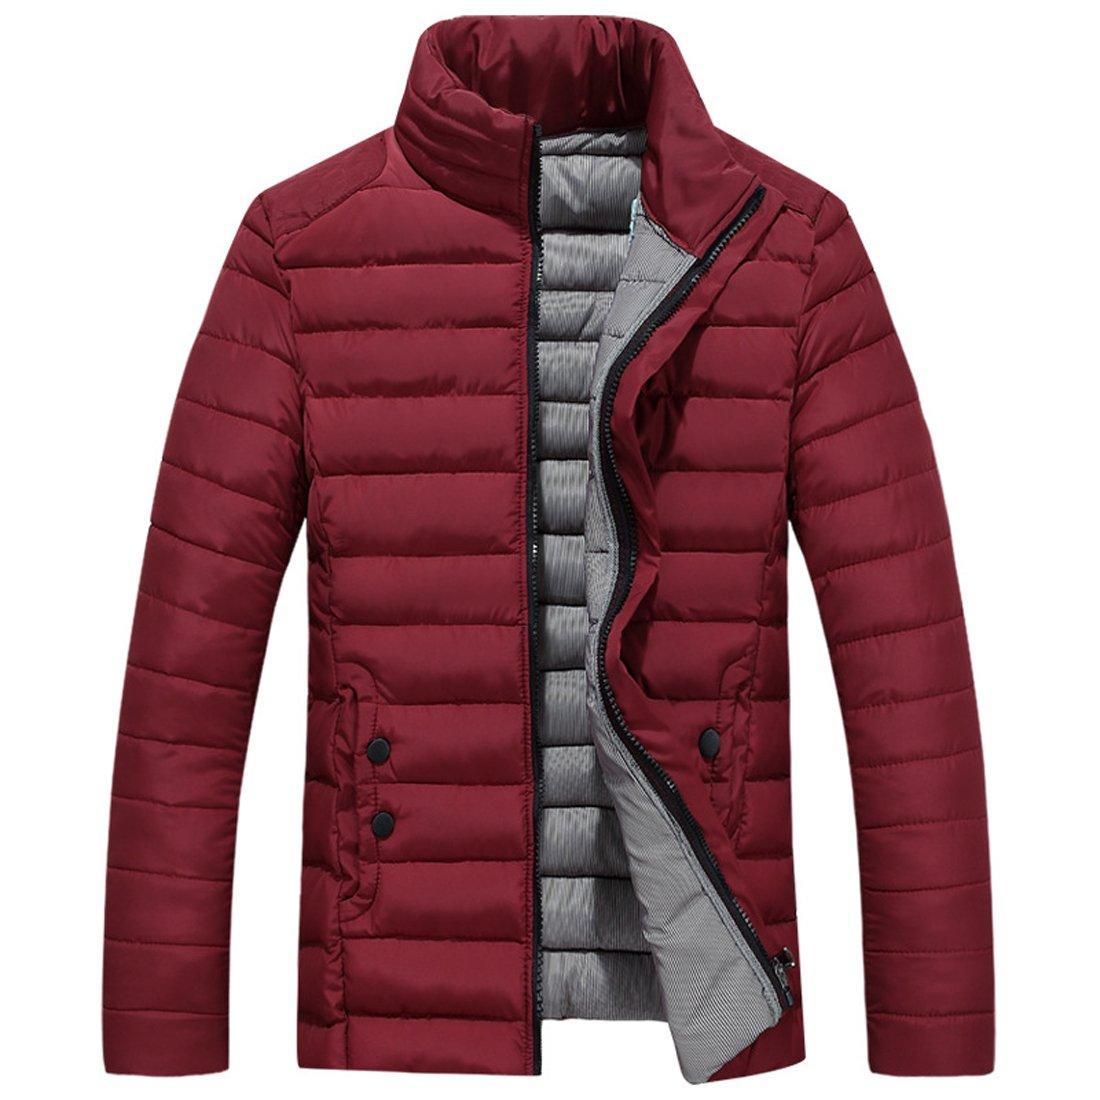 SiDiOU Group Mens Down Puffer Jacket Winter Warm Down Padded Jacket Coats